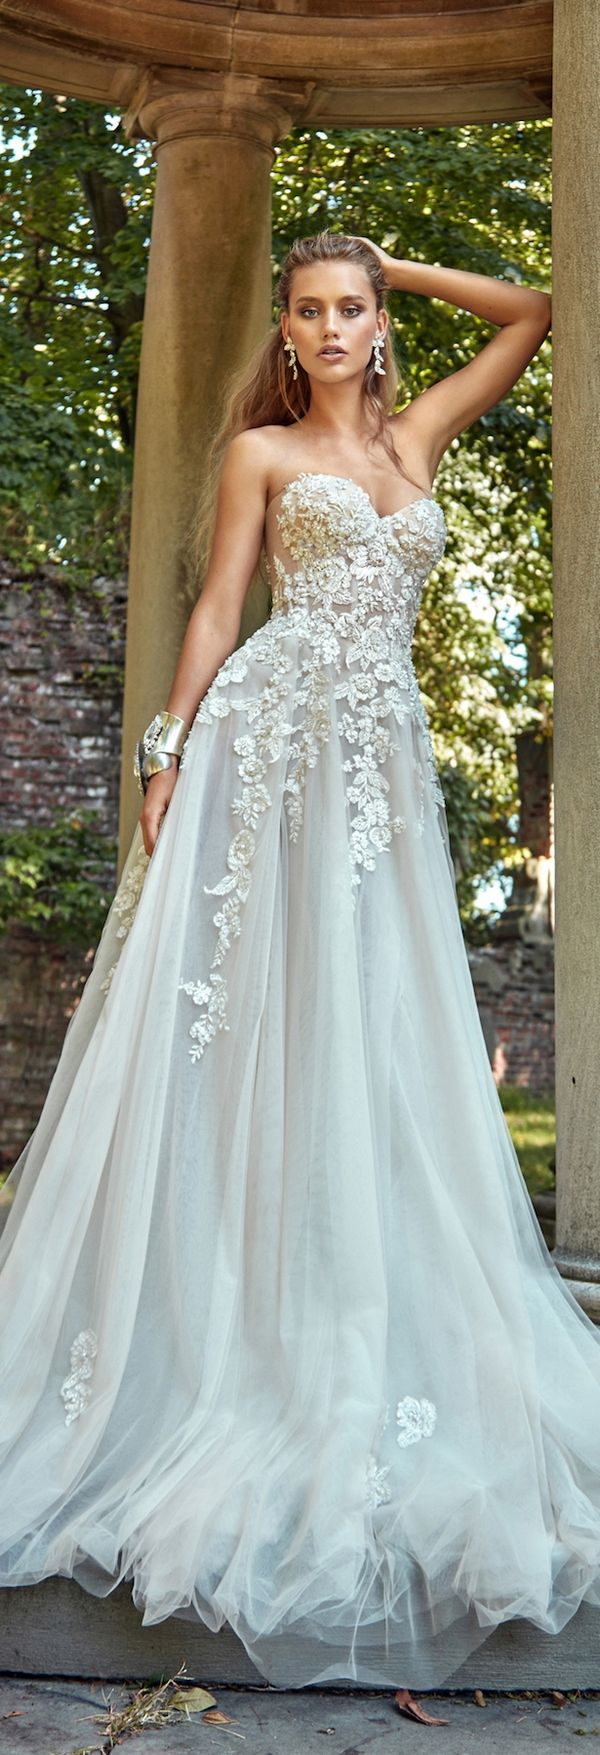 Galia lahav fall wedding dresses u le secret royal ii u gala iii